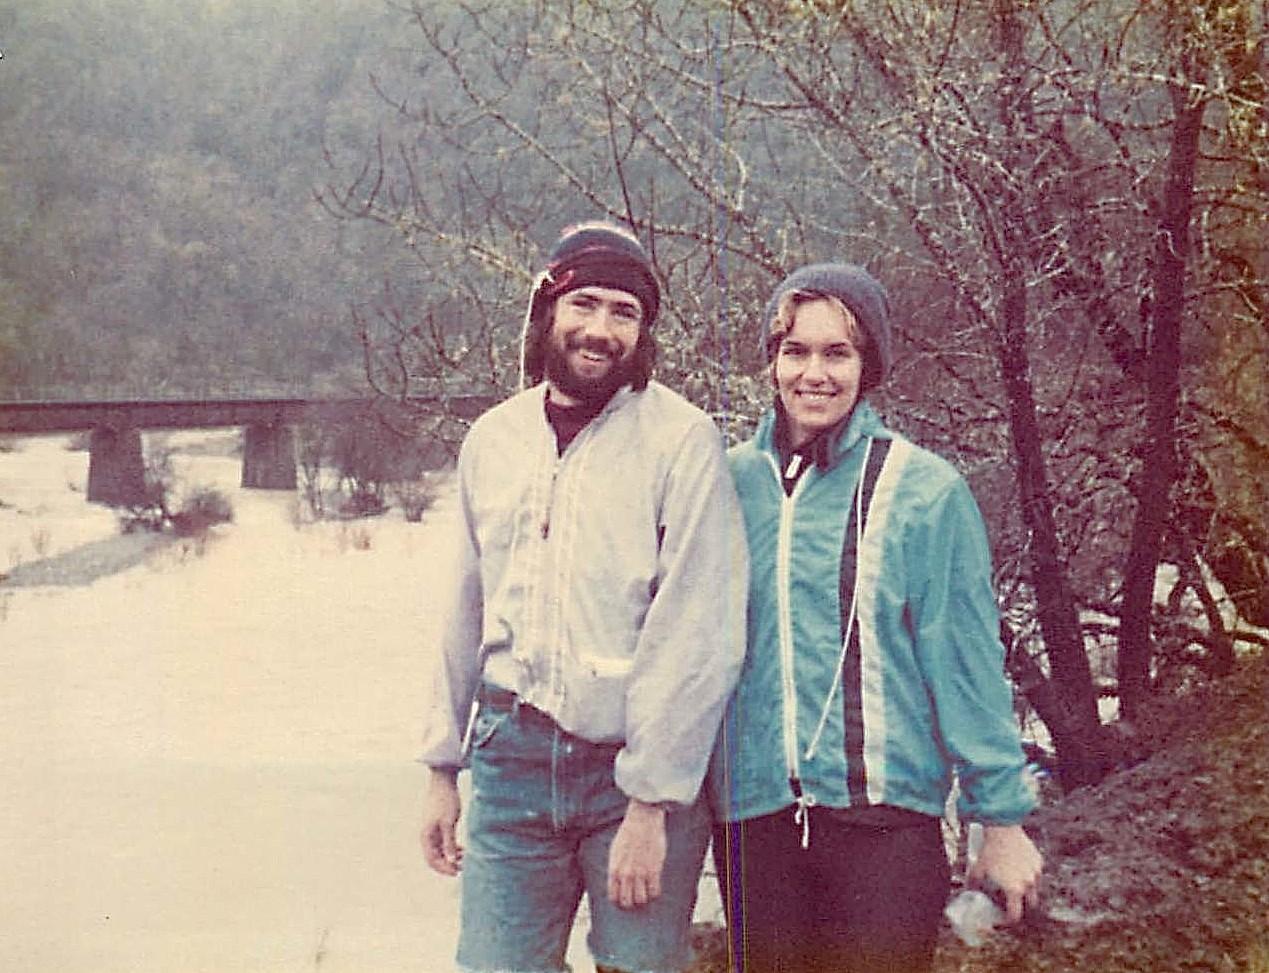 John Wagner, Lorraine Gudas Eel River rafting, spring 1980